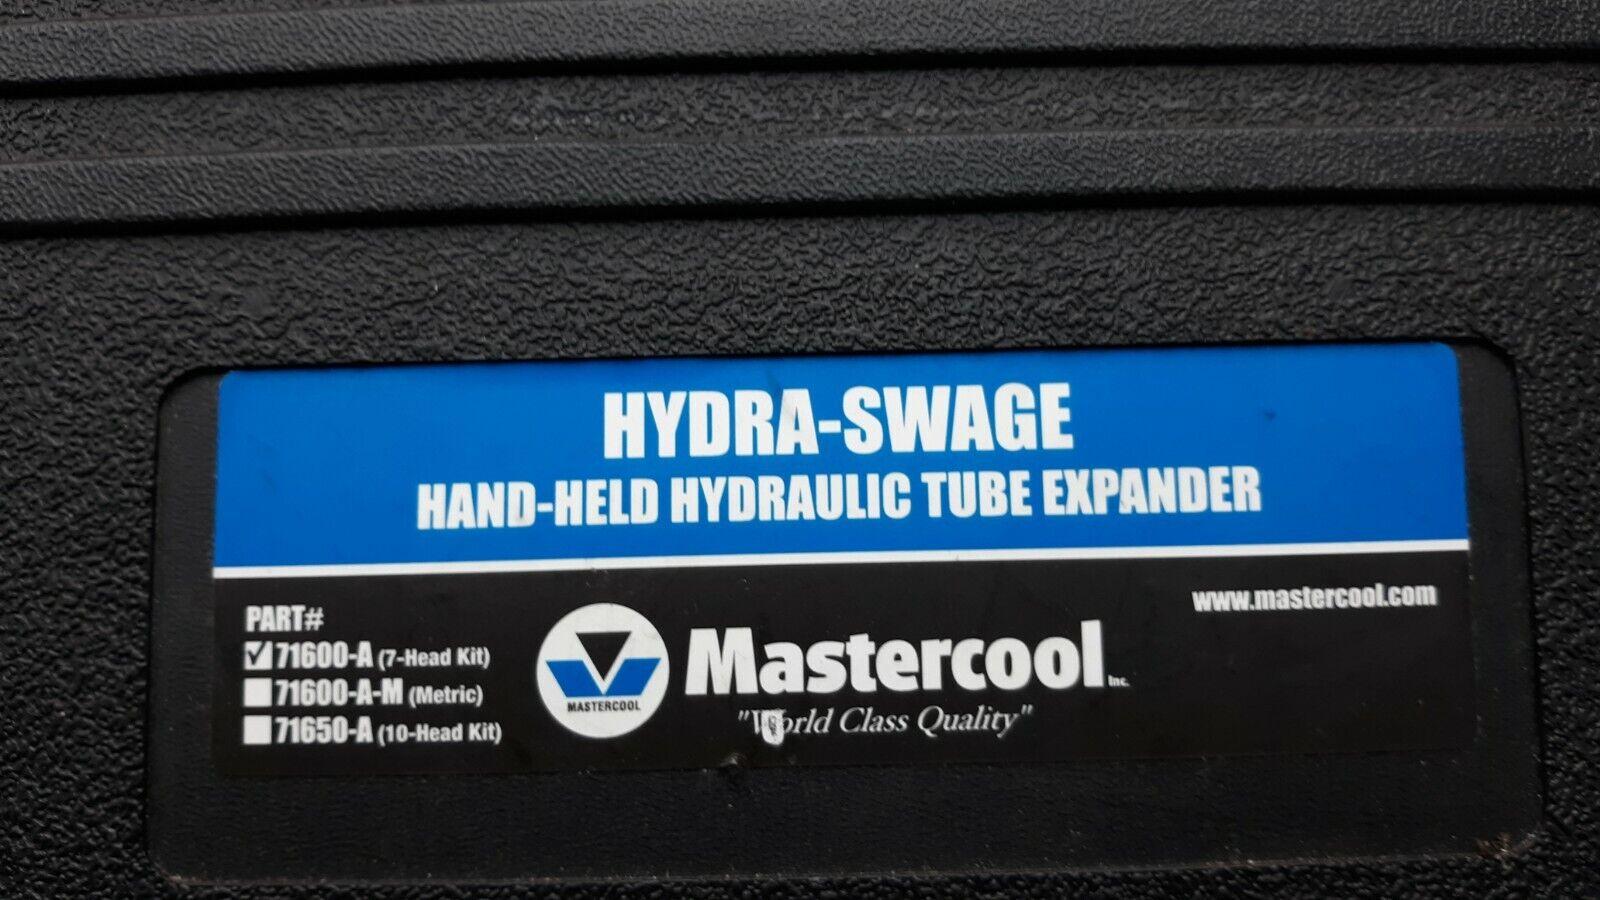 Hydra Swage Hand Held Hydraulic Tube Expander. 71600-A - $36.00